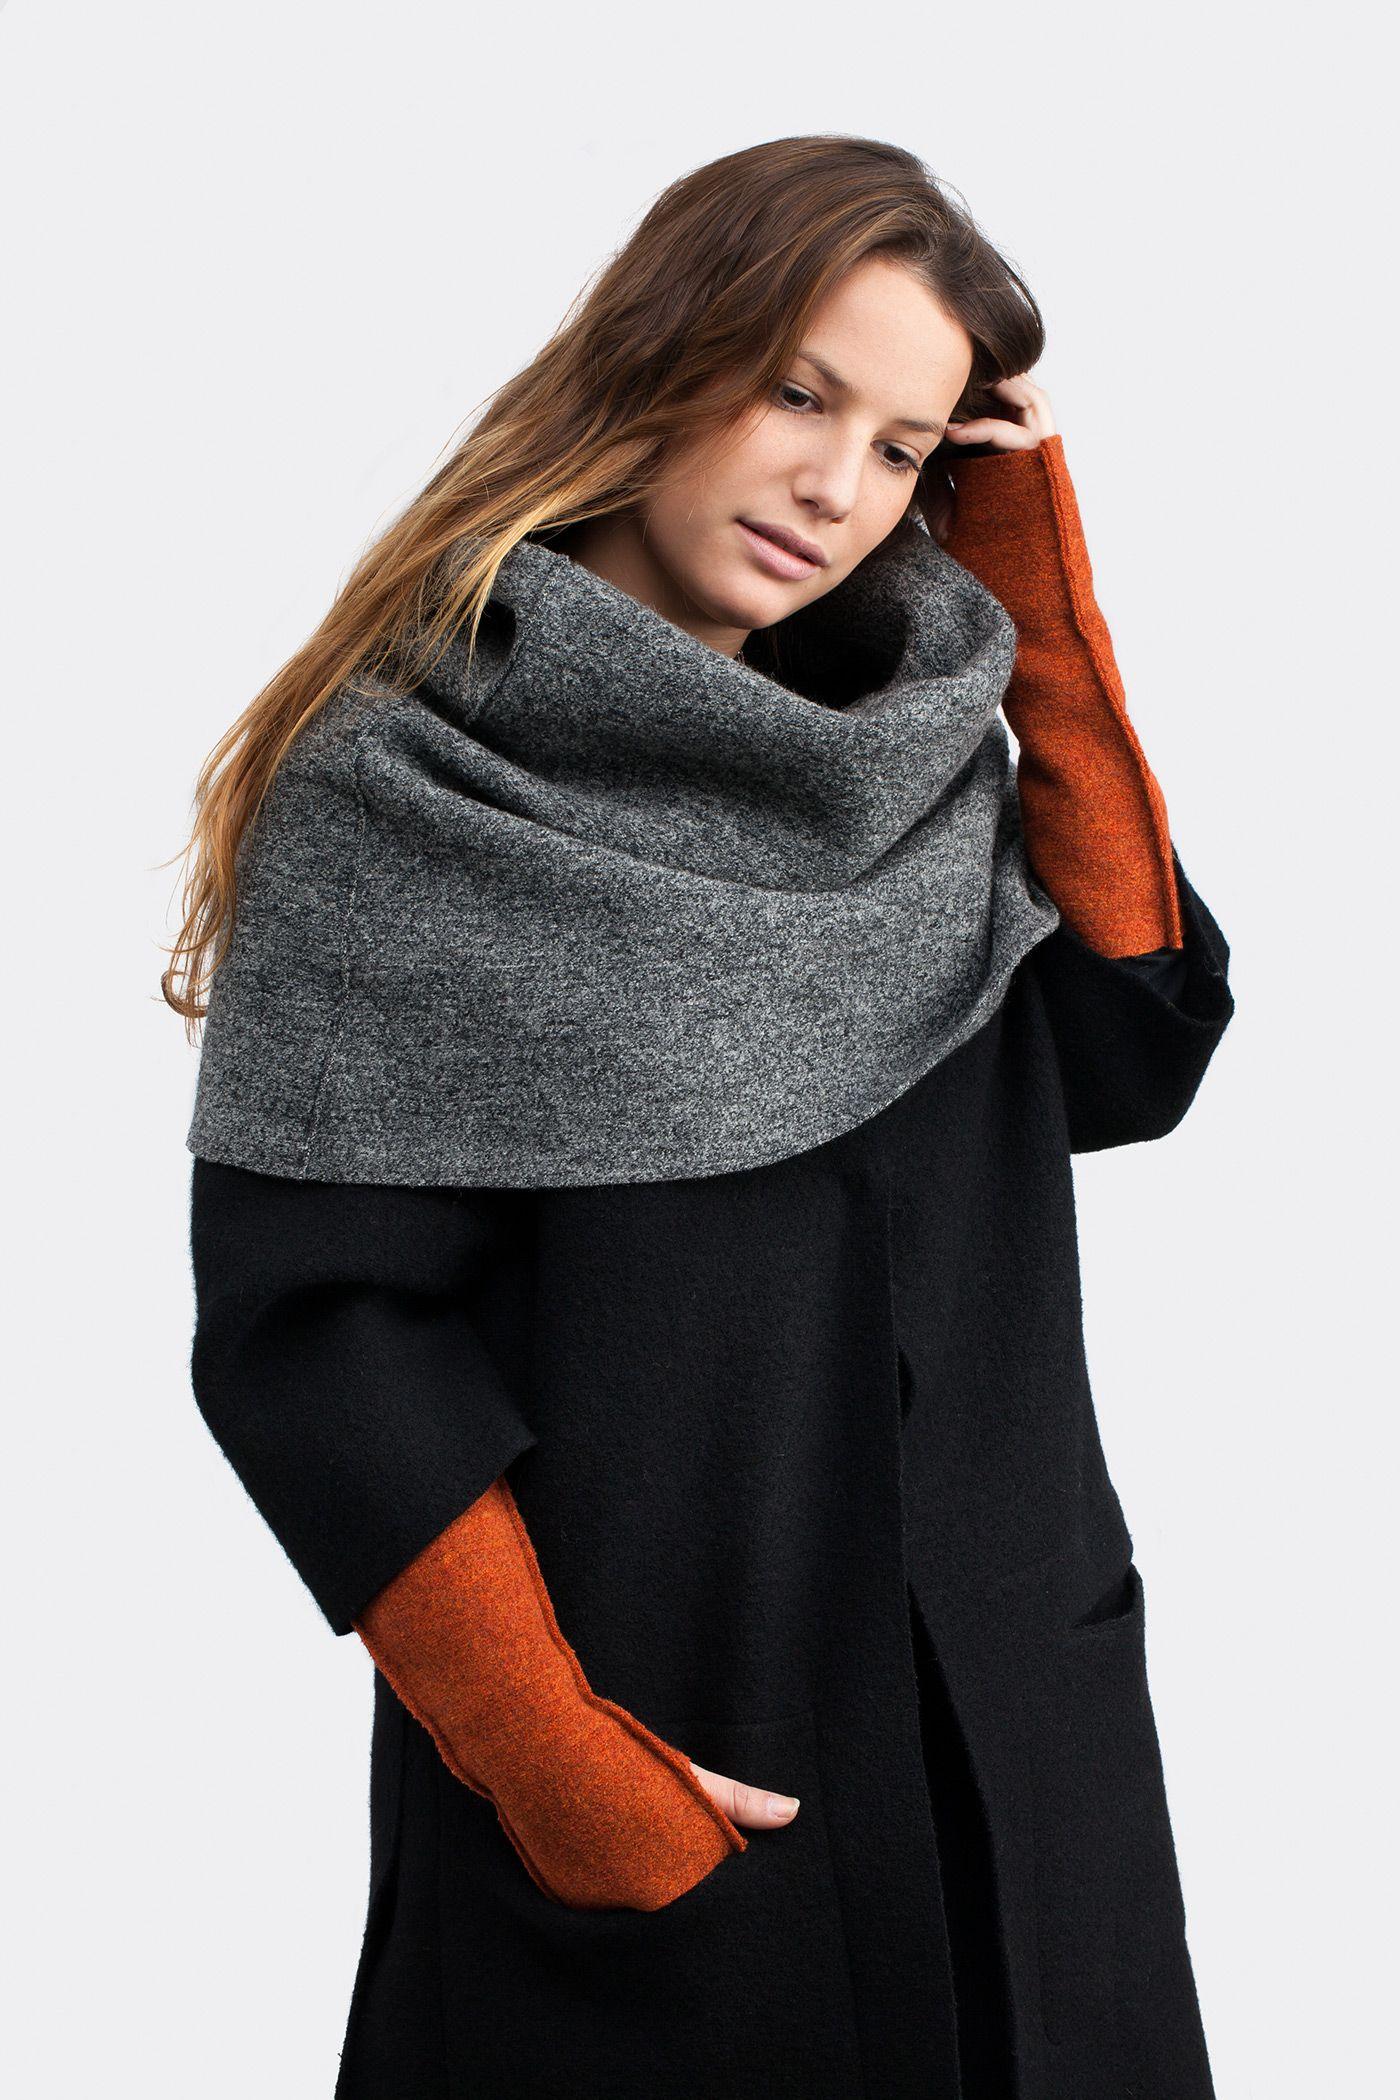 DIY Wool Snood weneedle.com